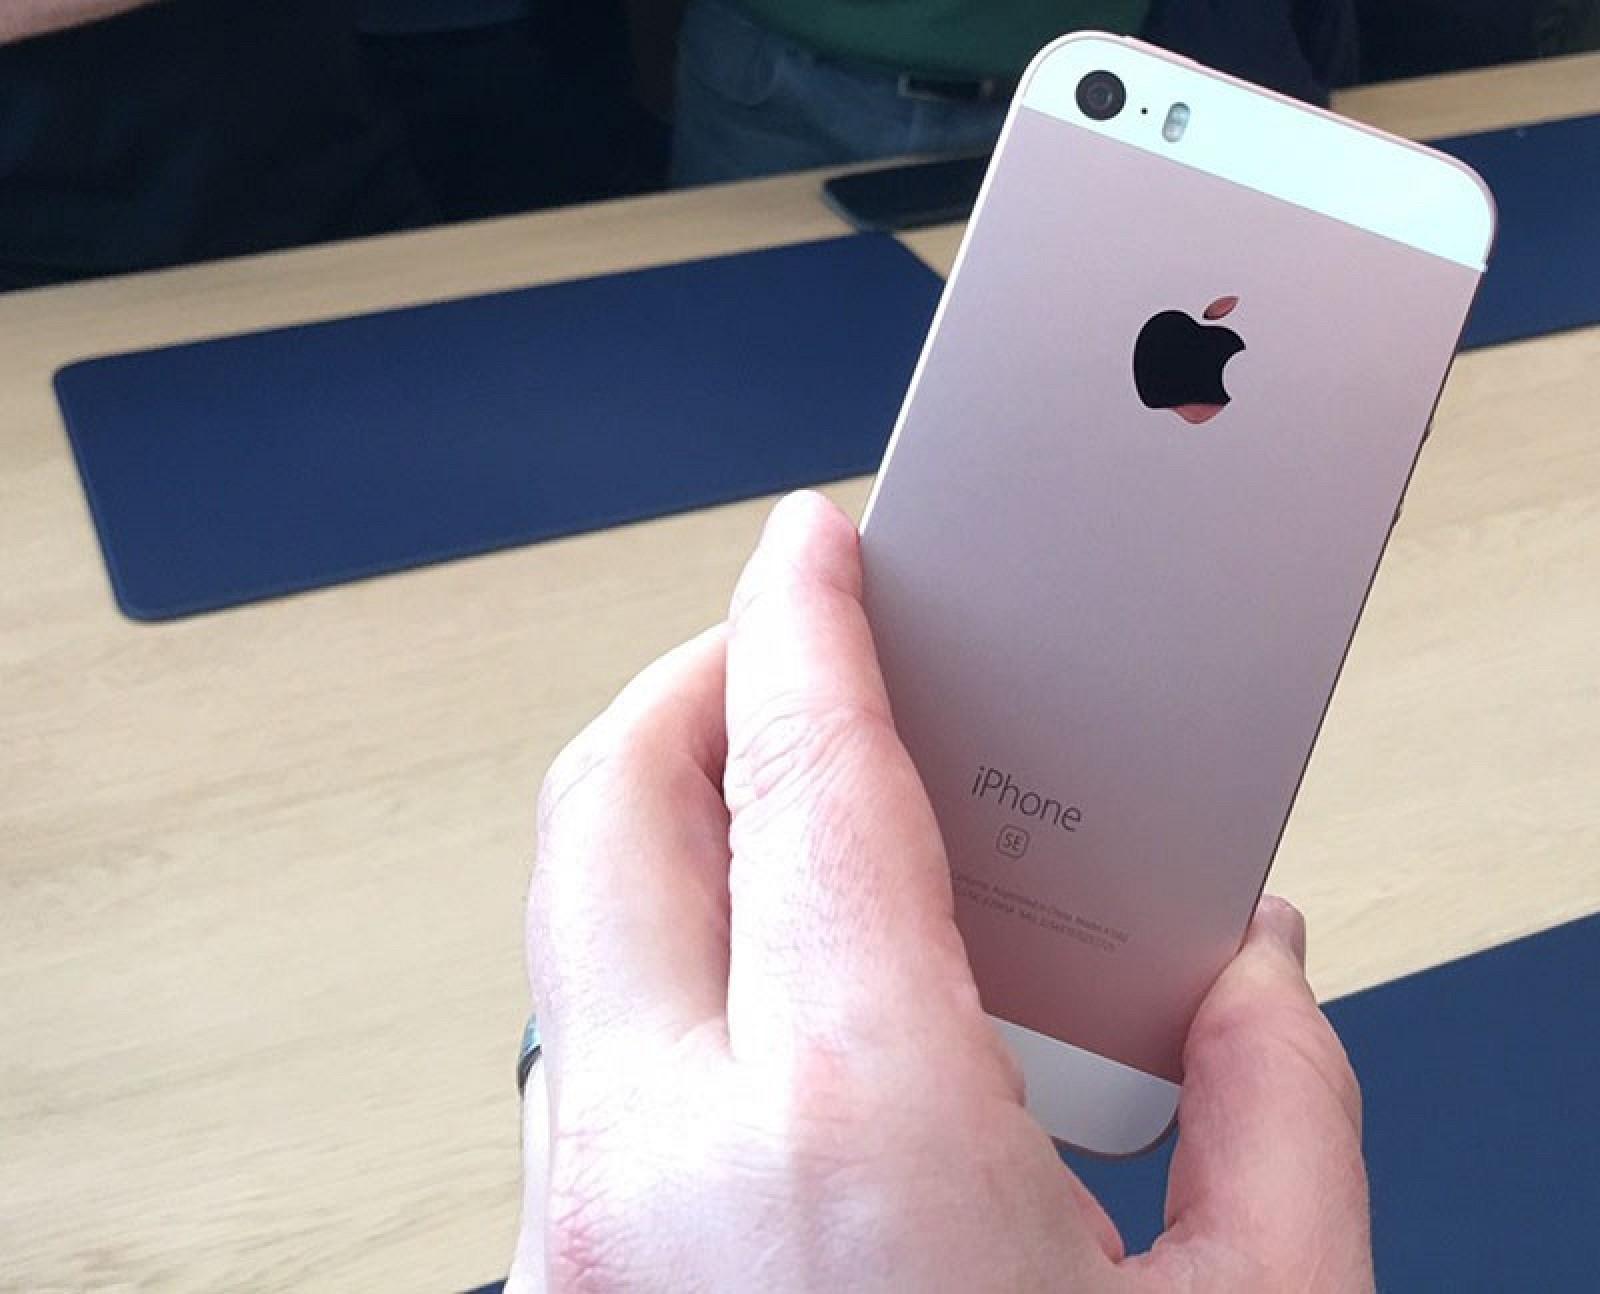 iPhone-SE-hands-on-1-800x647.jpg